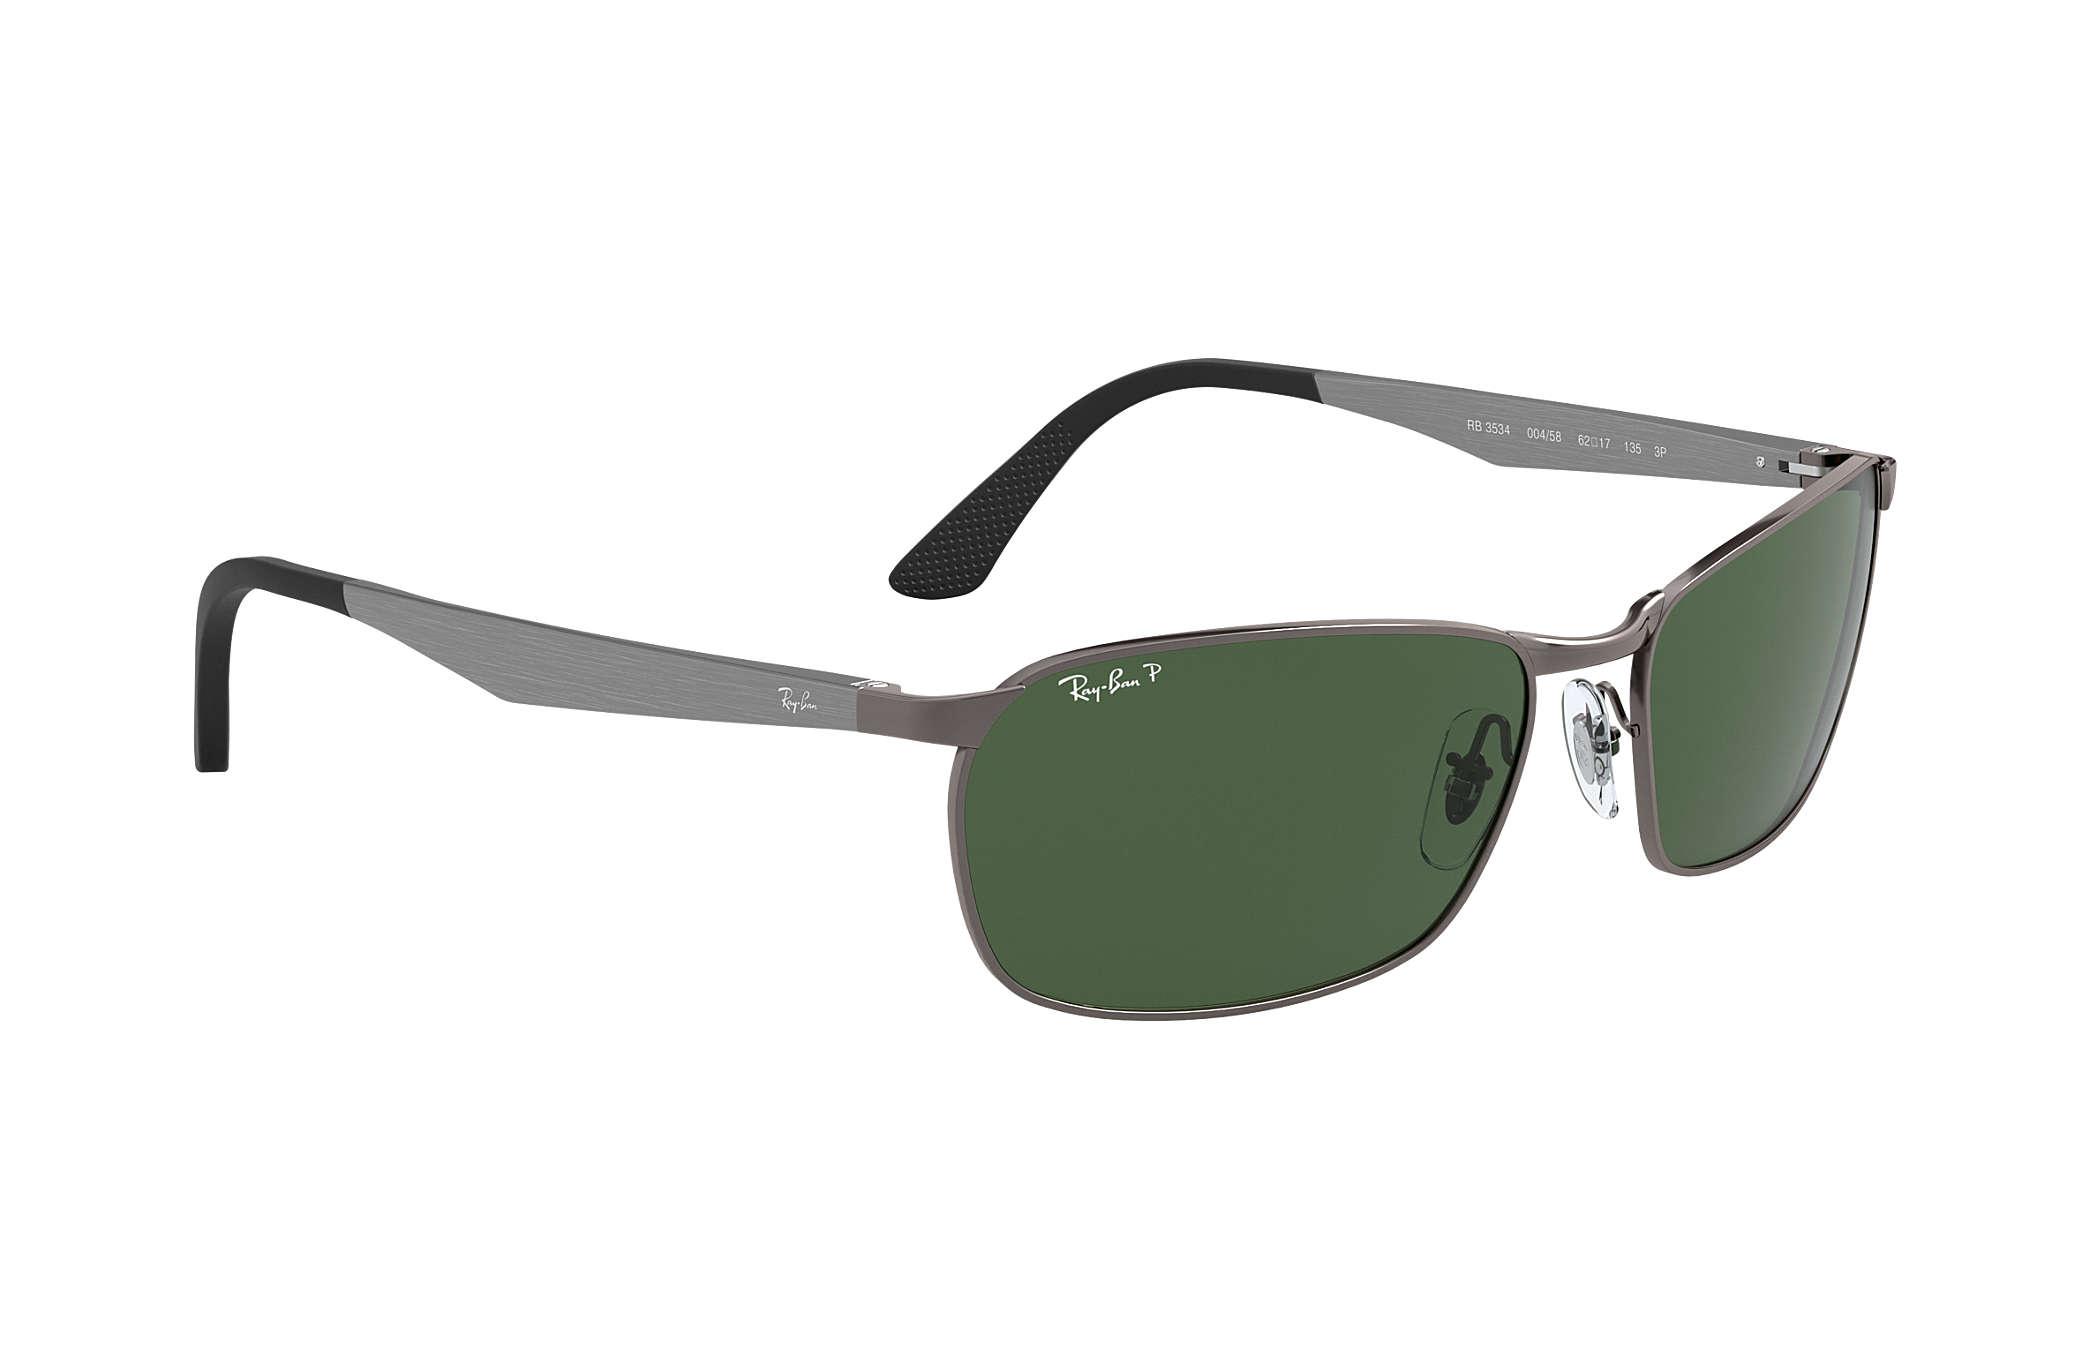 7711d8eb1ba0a Ray-Ban RB3534 Gunmetal - Metal - Green Polarized Lenses ...